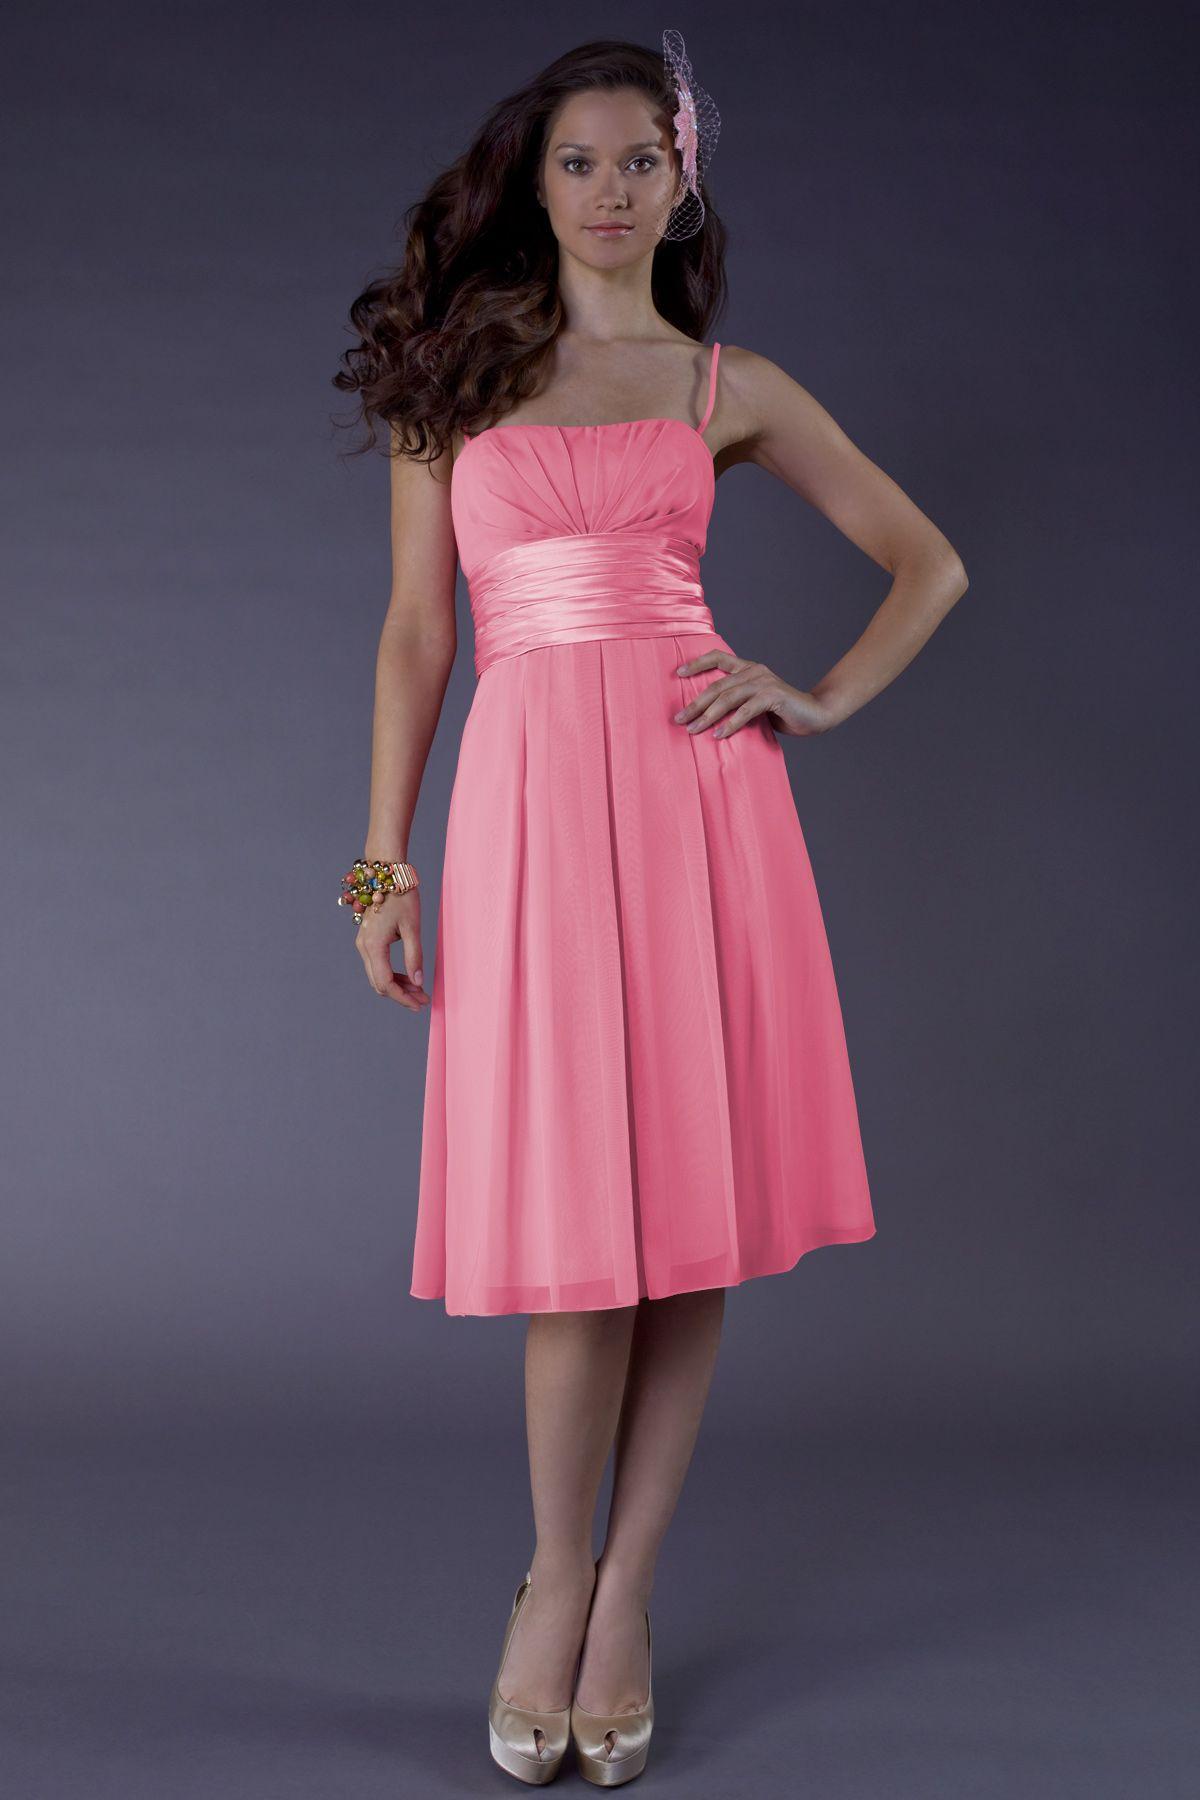 SpaghettI straps chiffon dress with natural   clothing   Pinterest ...